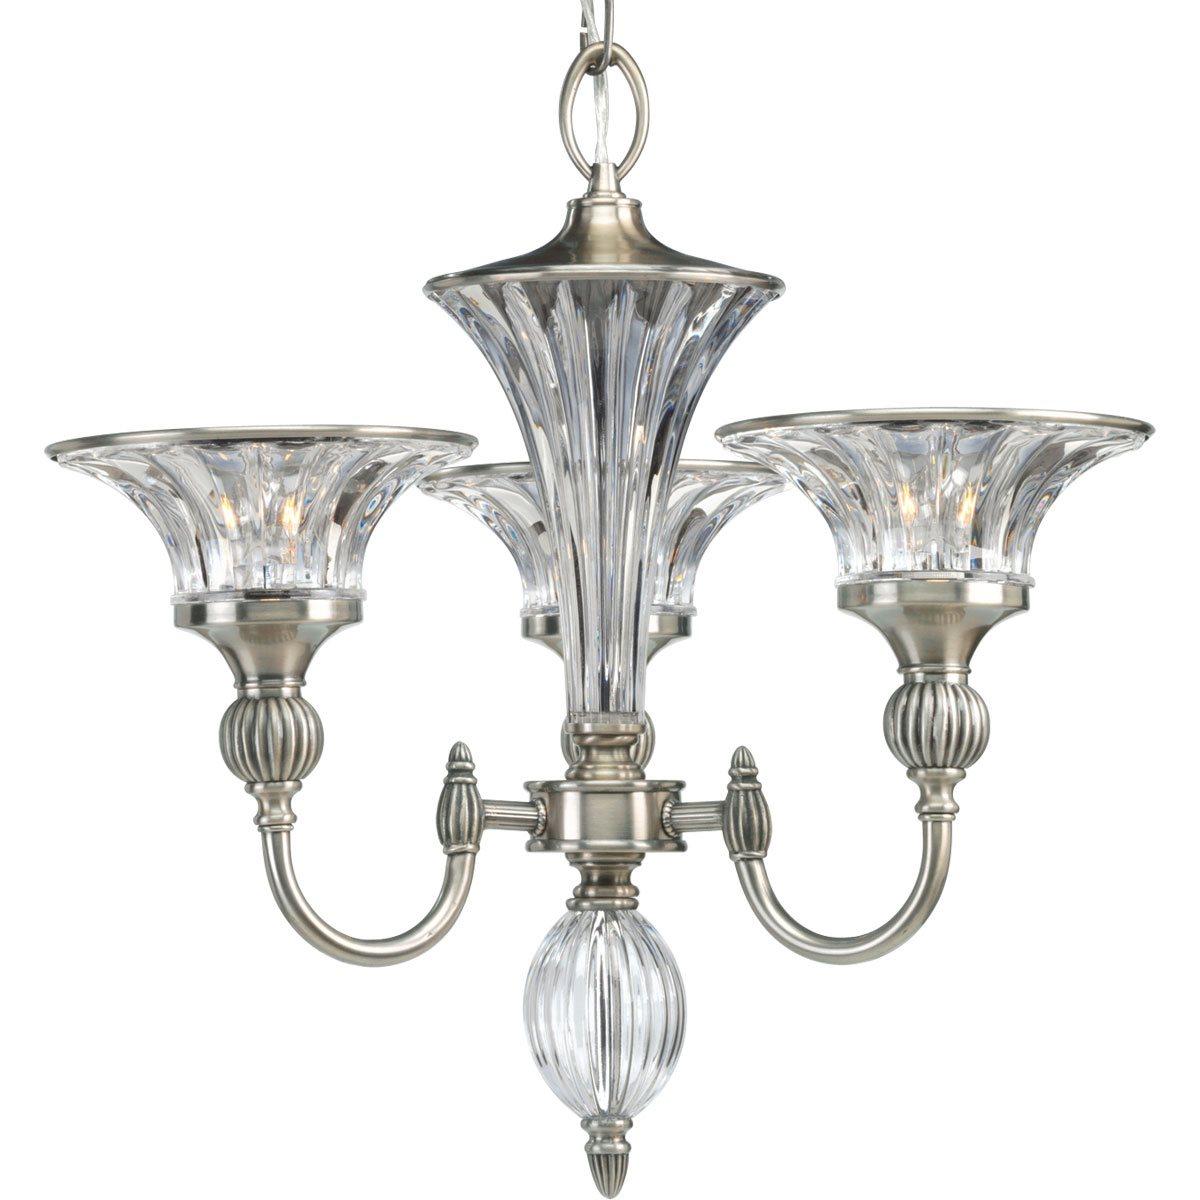 thomasville lighting p4504 101 roxbury transitional 3 light chandelier pg p4504 101